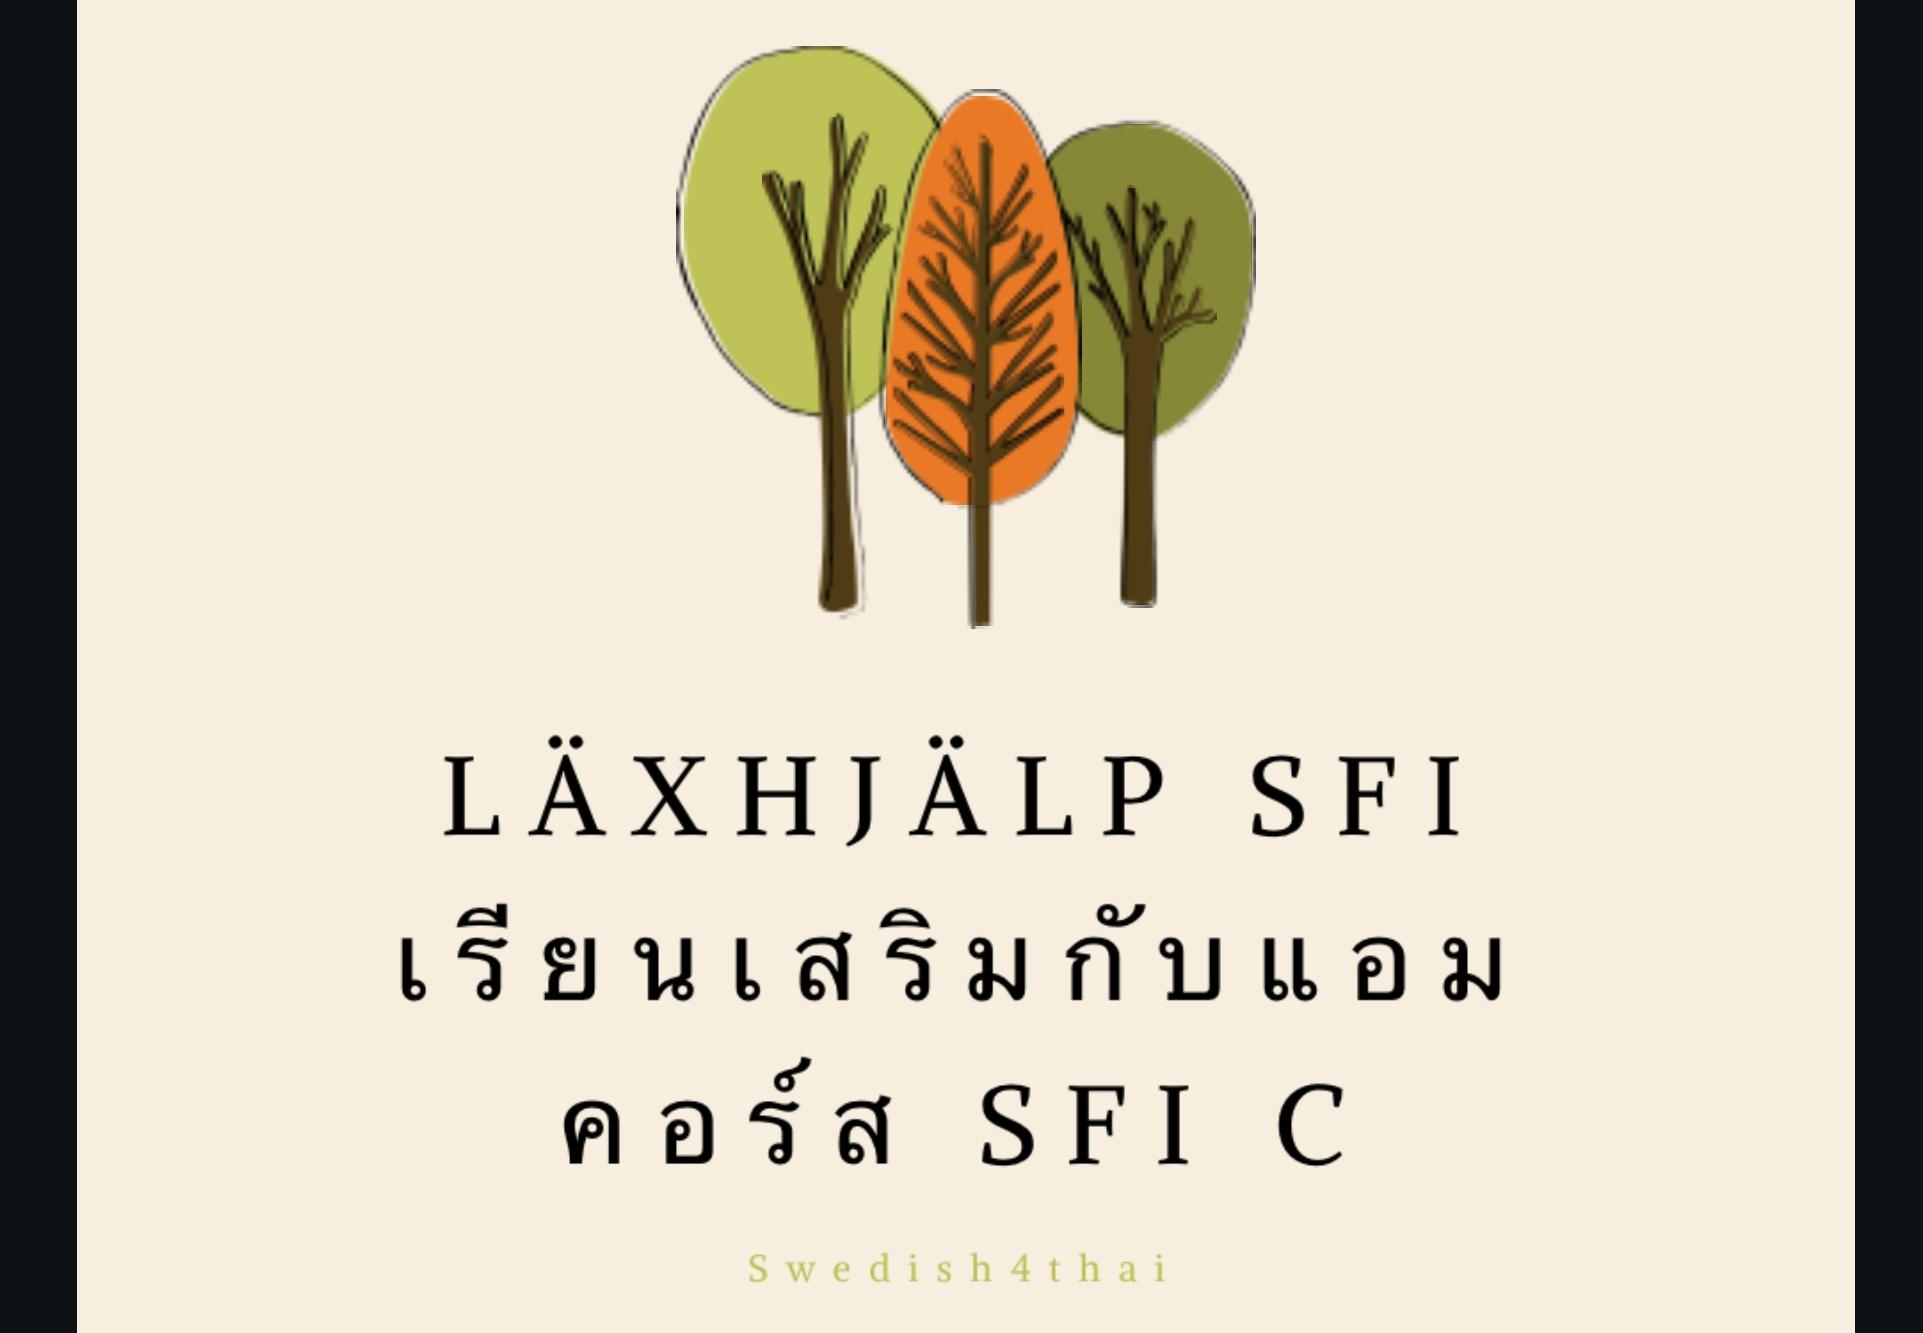 Läxhjälp - เรียนเสริม SFI C กับแอม